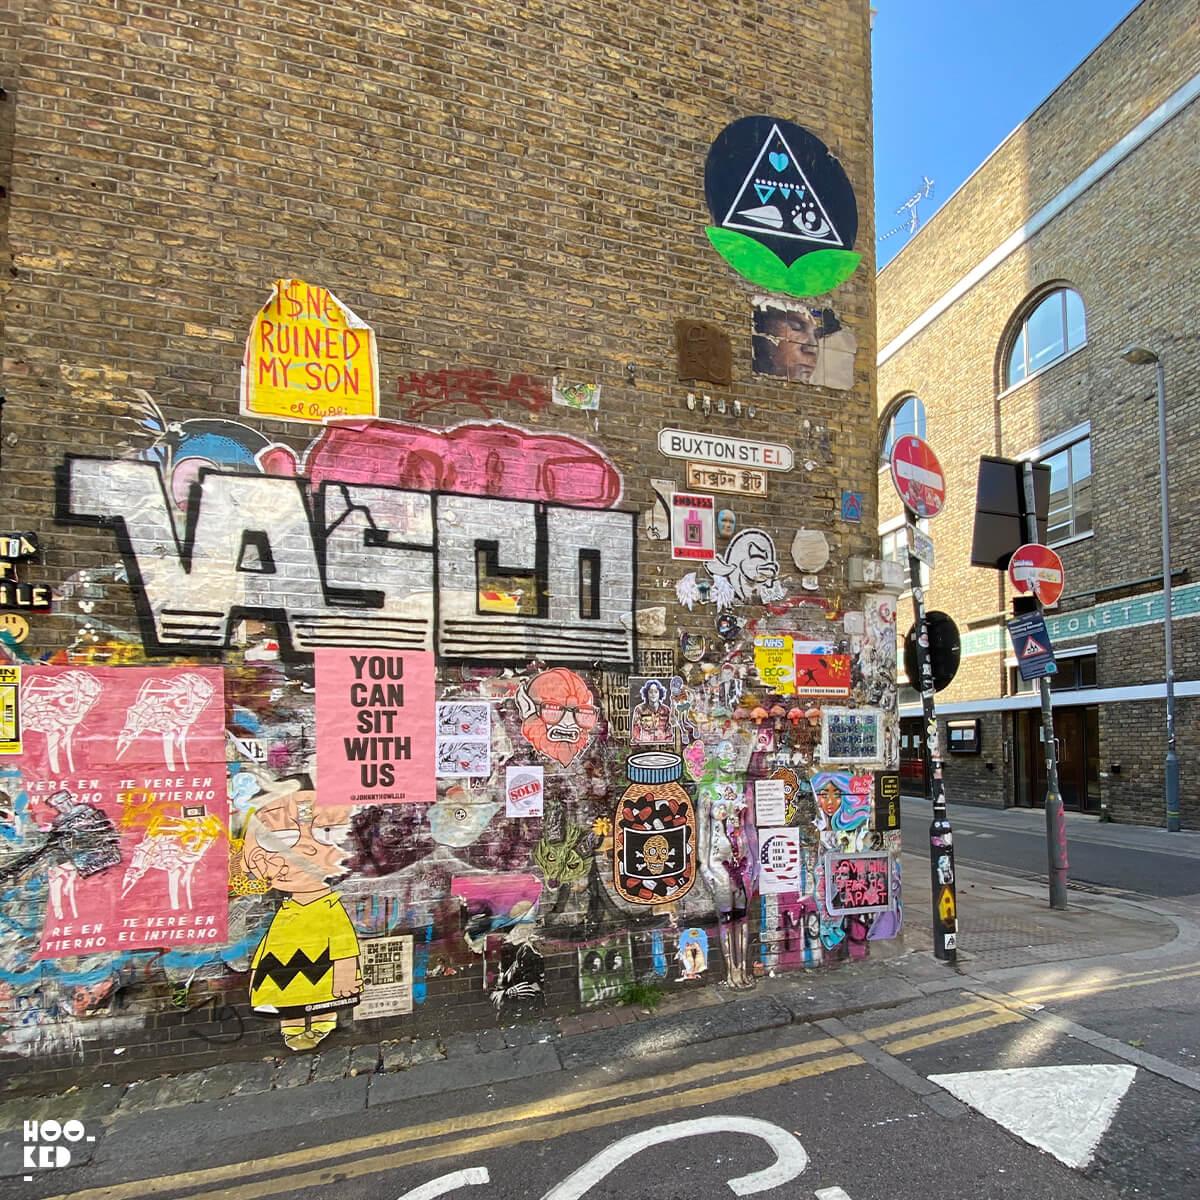 5 Brick Lane Street Art Hotspots for Paste-ups, Buxton Street